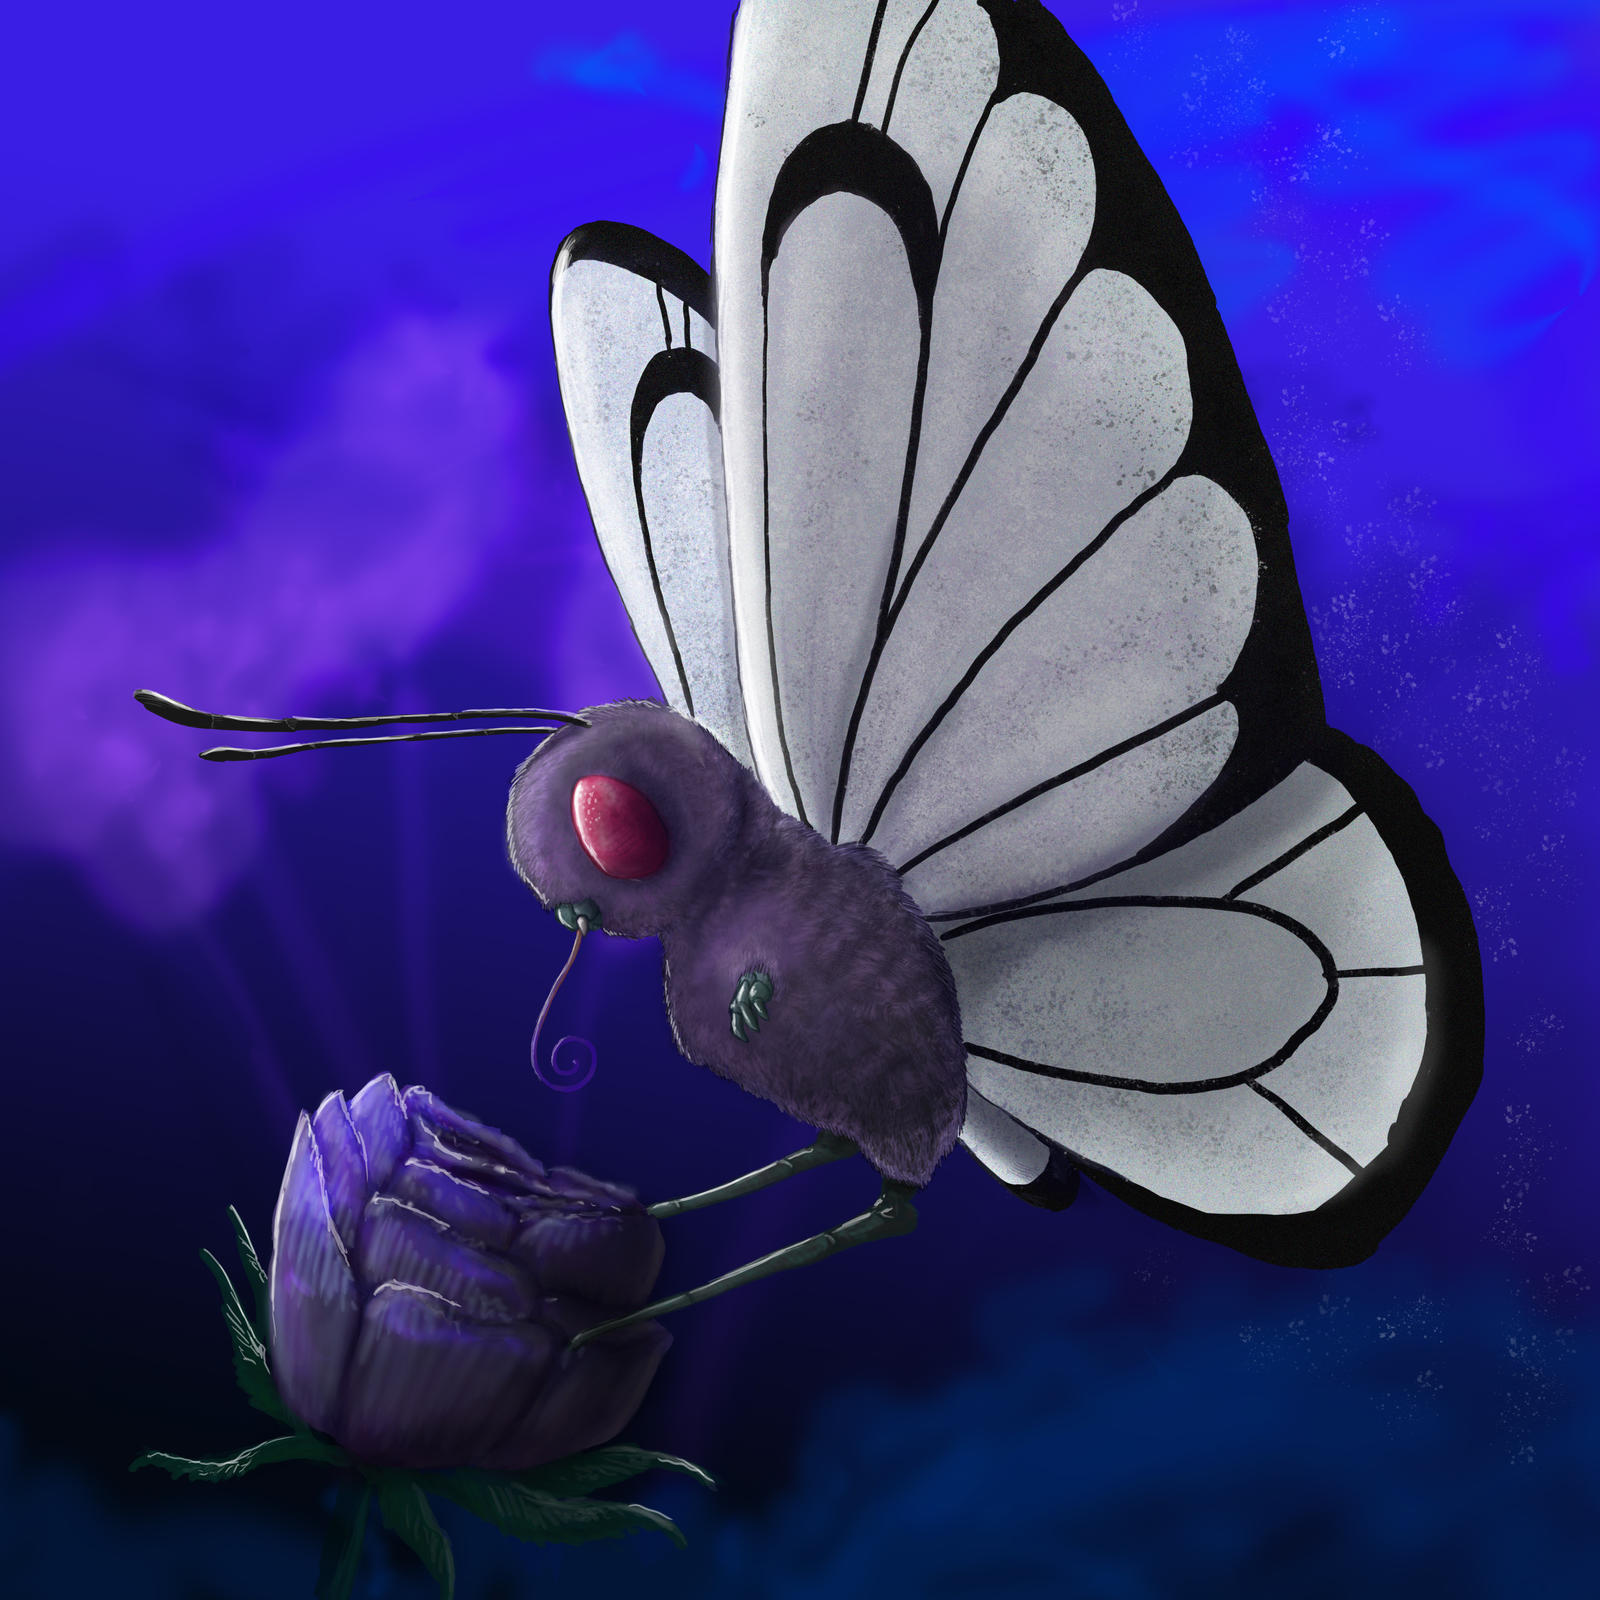 Butterfree by JoshuaDunlop